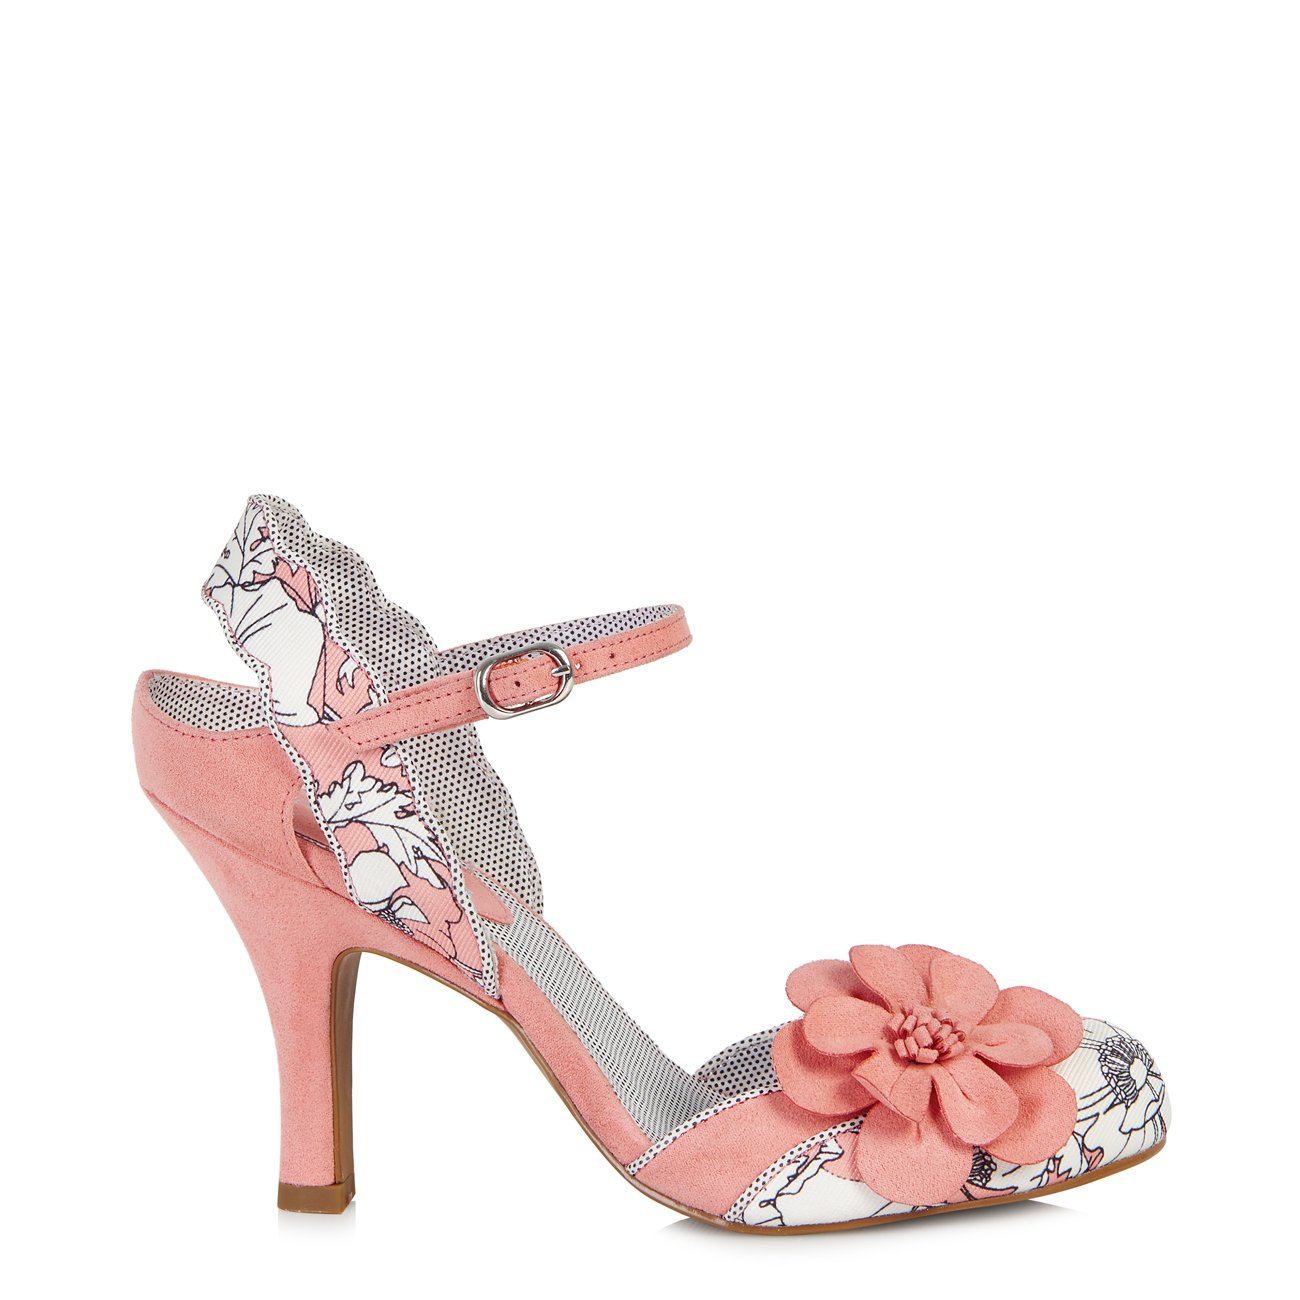 Ruby Shoo Women's Peach Floral Heidi Fabric Slingback Pumps & Rio Bag UK 5 EU 38 by Ruby Shoo (Image #3)